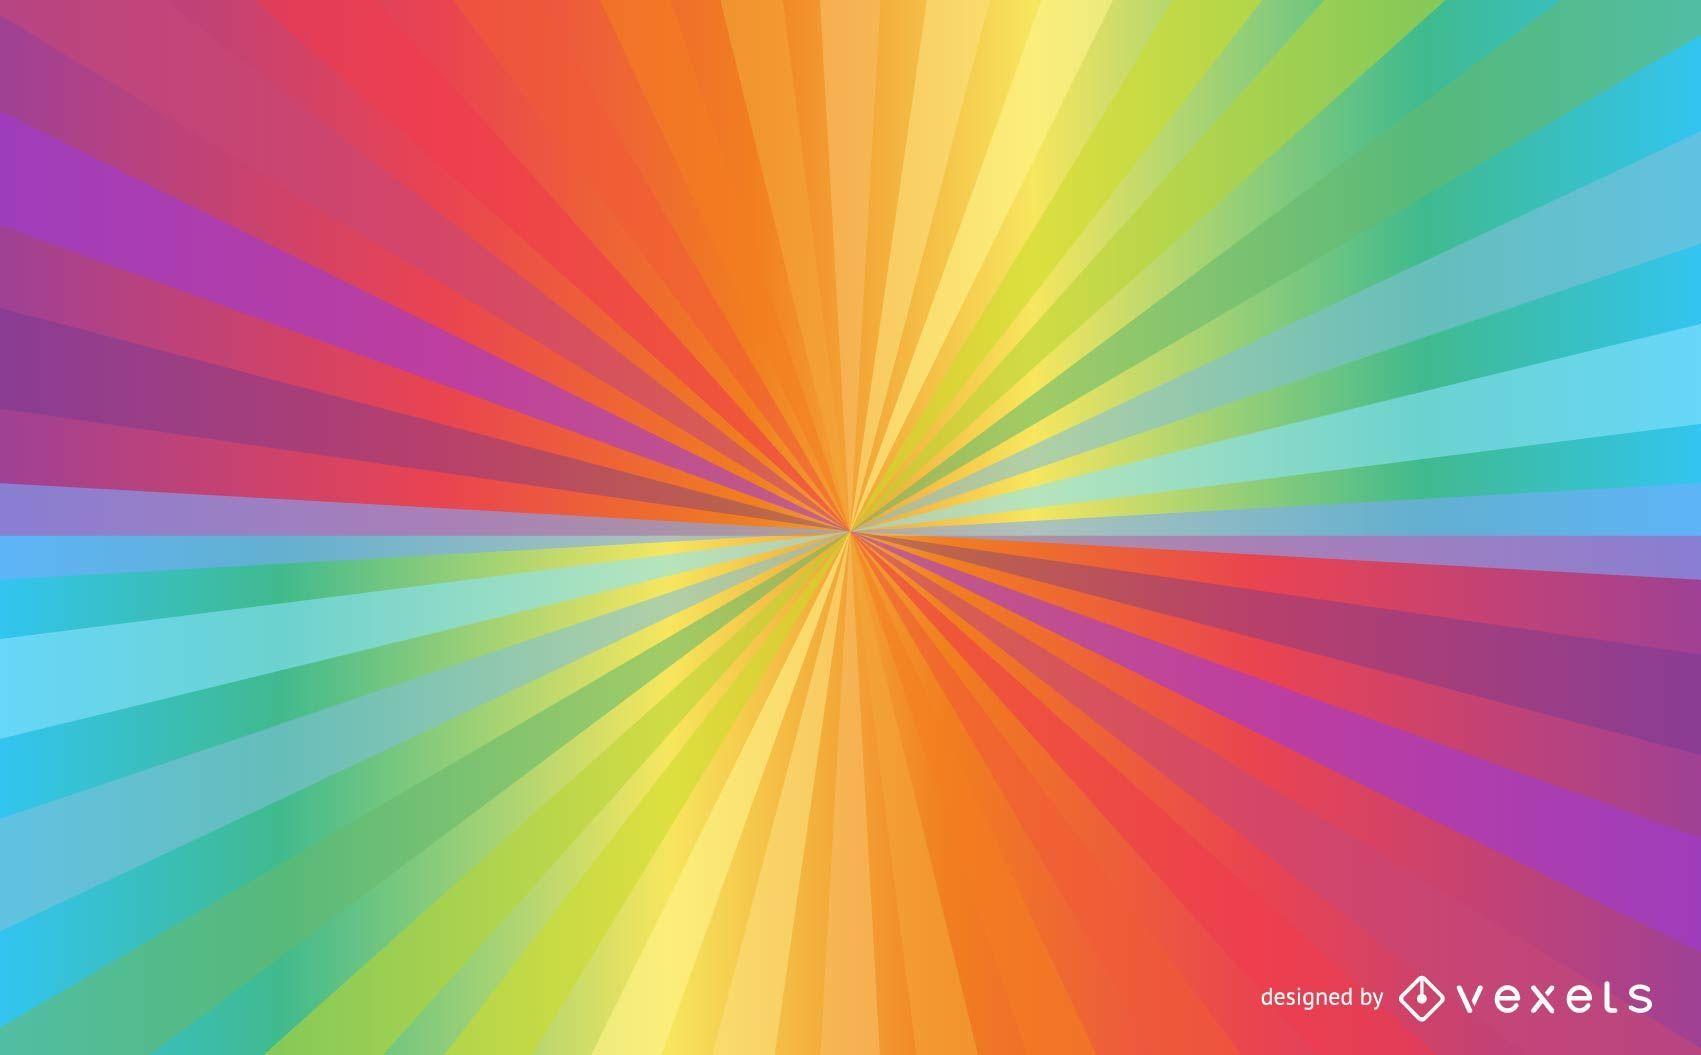 Bright Rainbow Sunbeam Background - Vector download